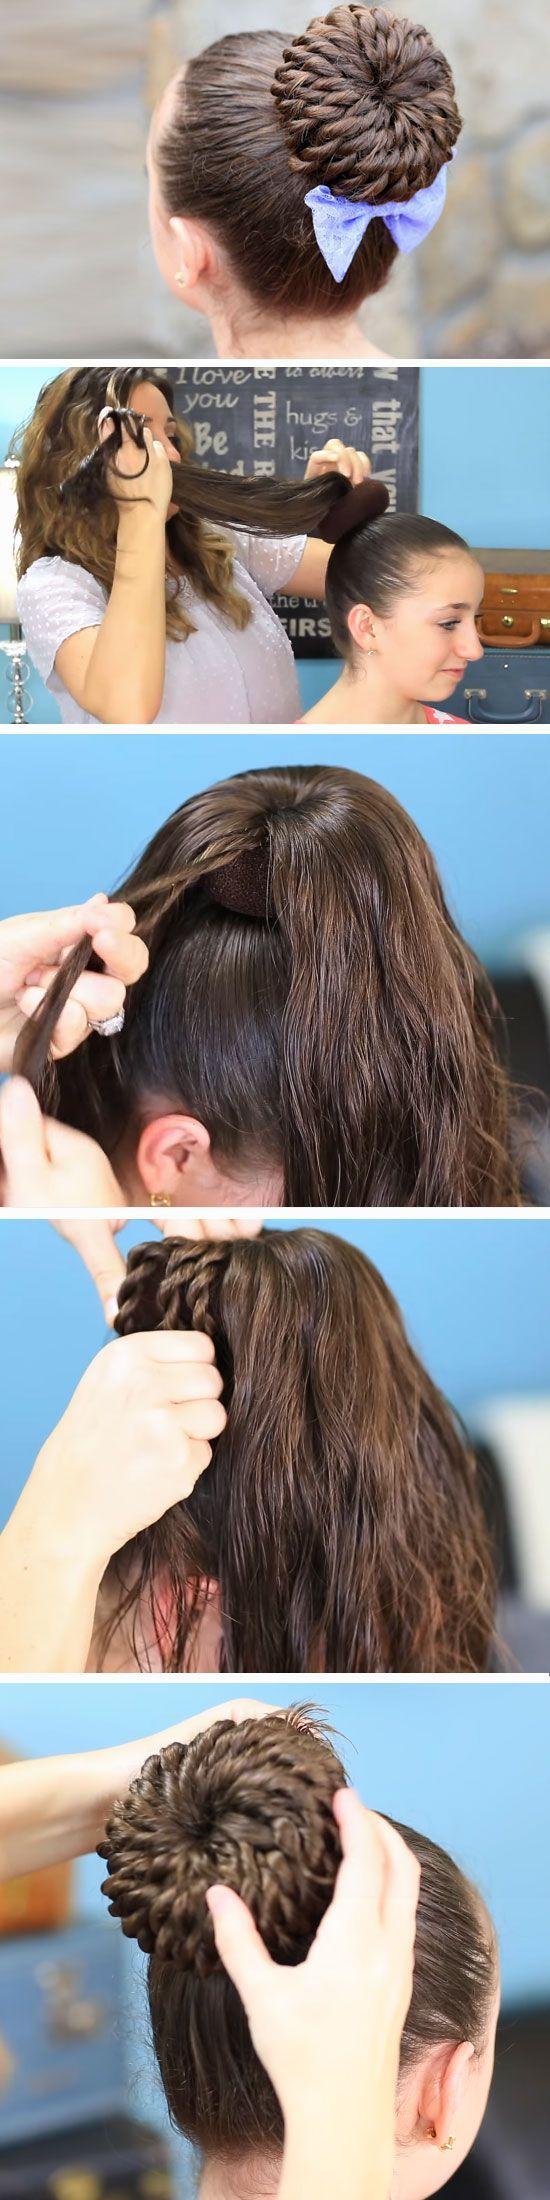 15 Easy DIY Prom Hairstyles For Medium Hair | Easy Homecoming Hairstyles, Homecoming  Hairstyles And Rope Twist